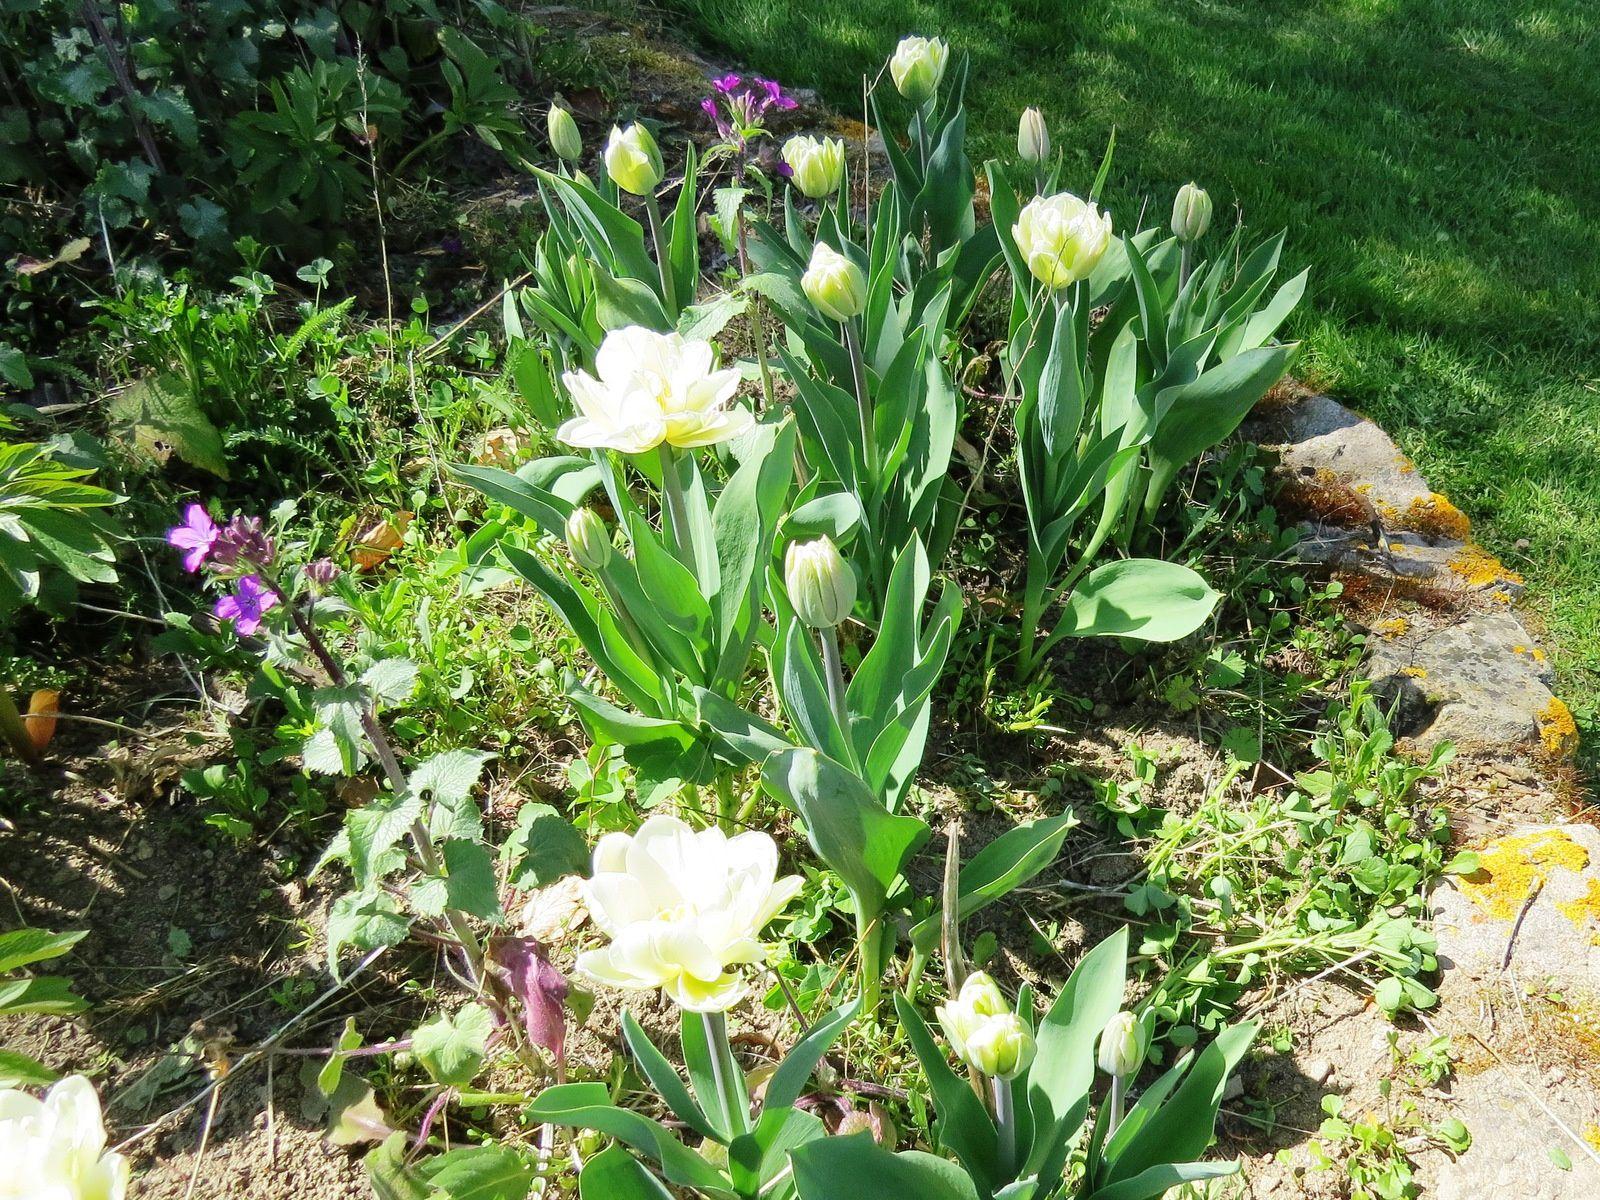 Tulipes le jardin de - Horaire vive le jardin bernay ...